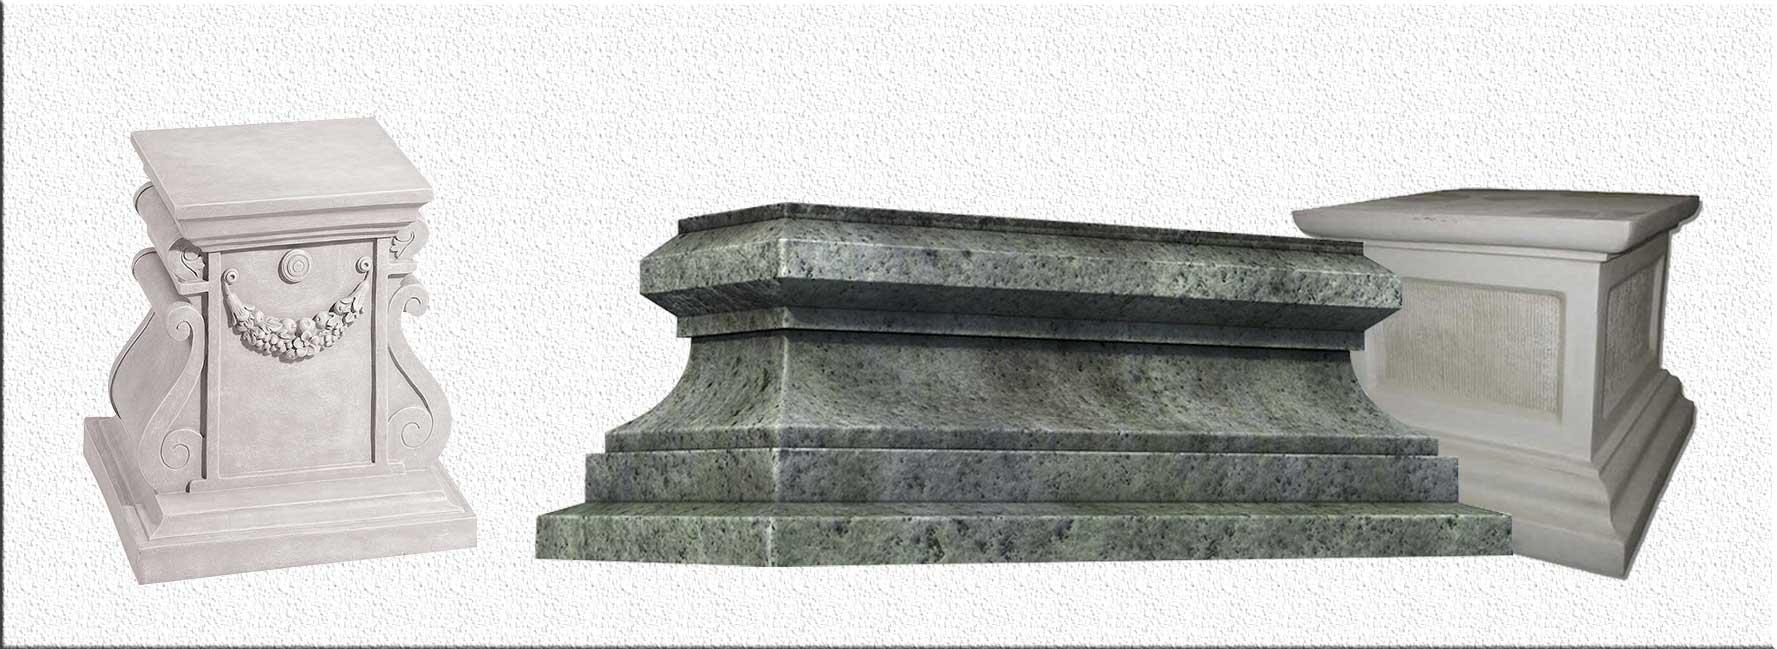 statue base 1 - پایهی مجسمه